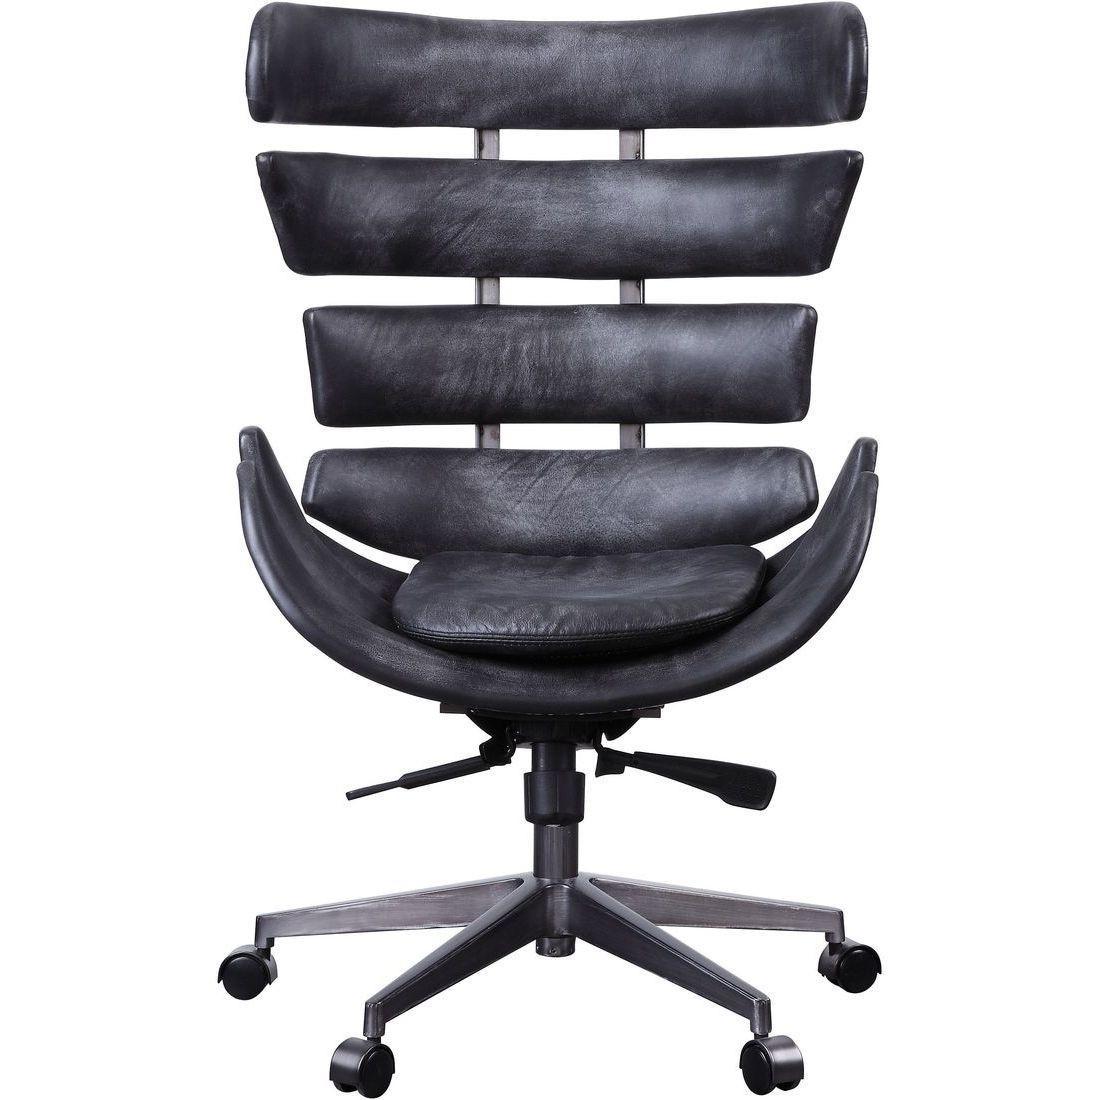 Home Office Chair Vintage Black Genuine Leather Aluminum Megan 92552 Acme Megan 92552